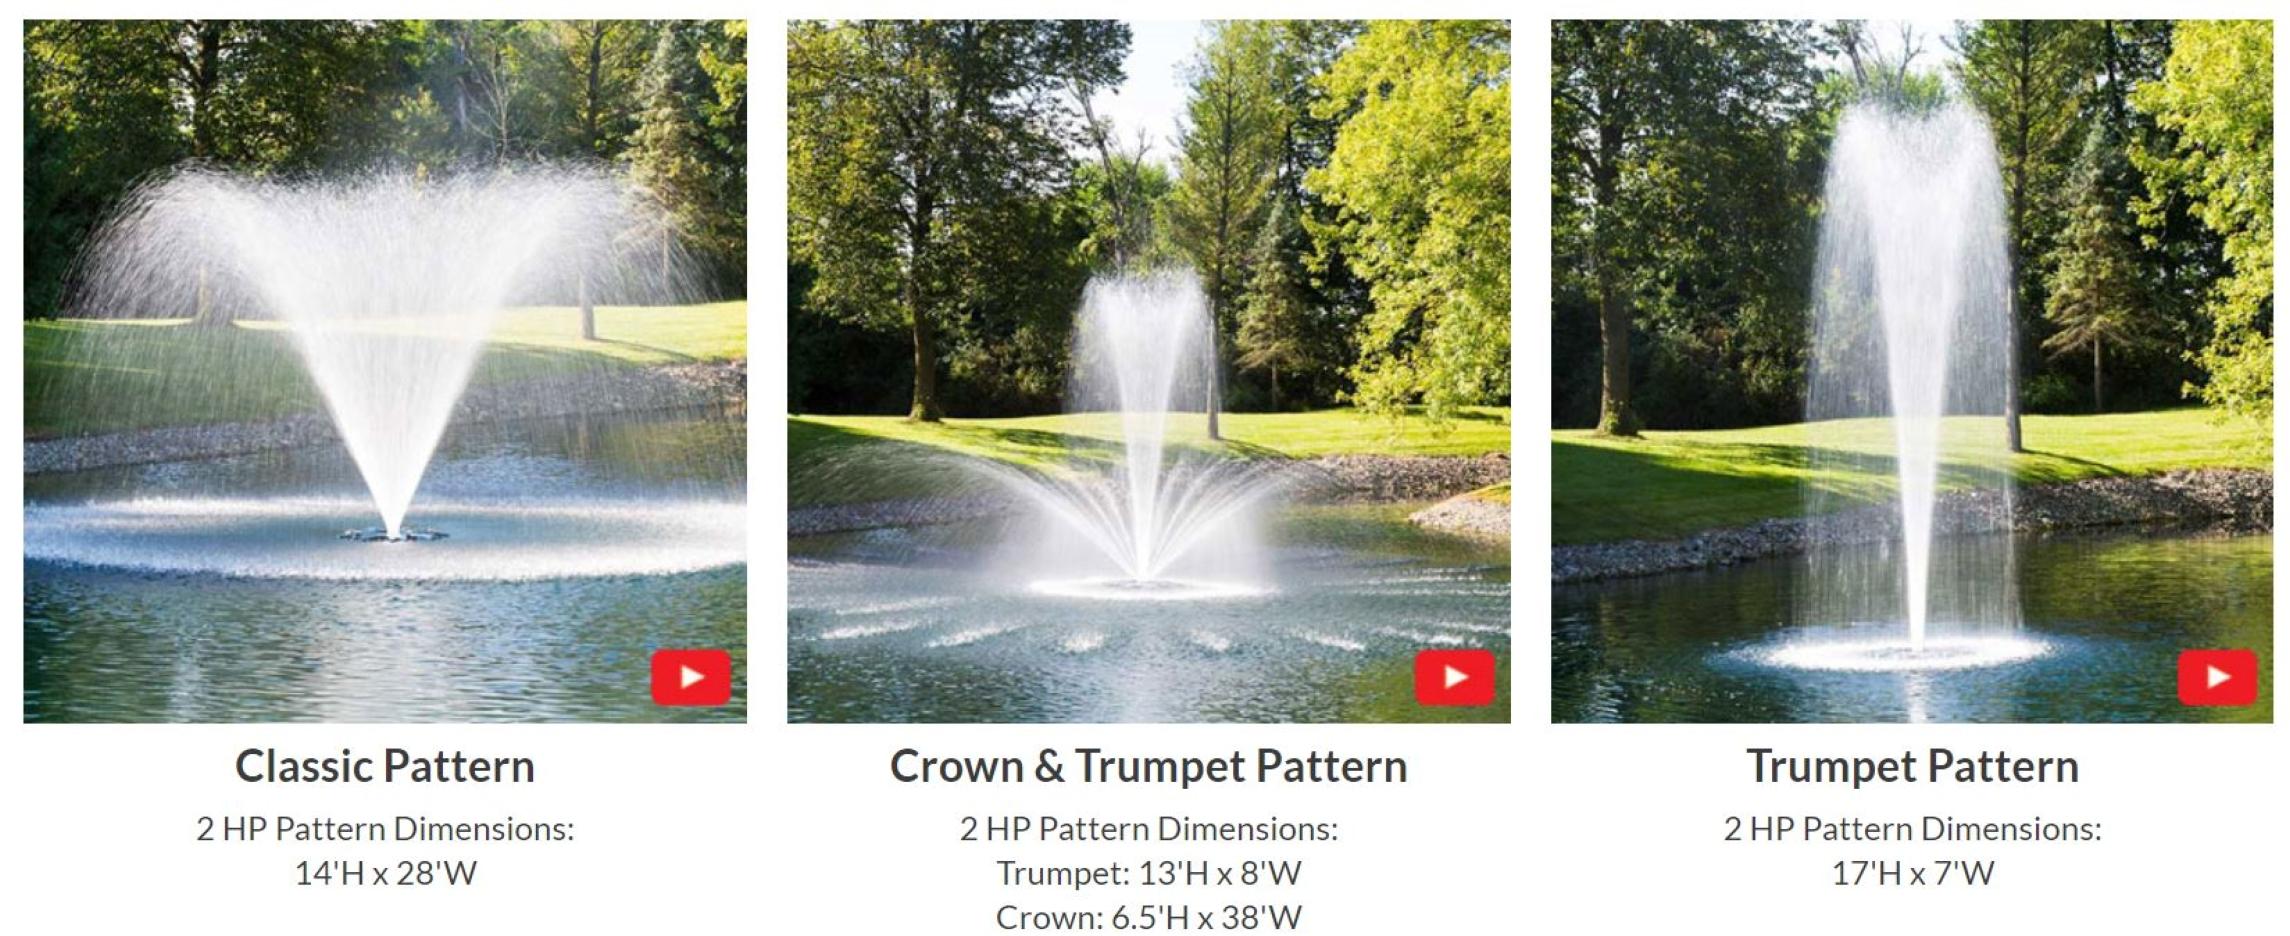 airmax-2hp-pondseries-pond-fountains-standard-spray-pattern.jpg